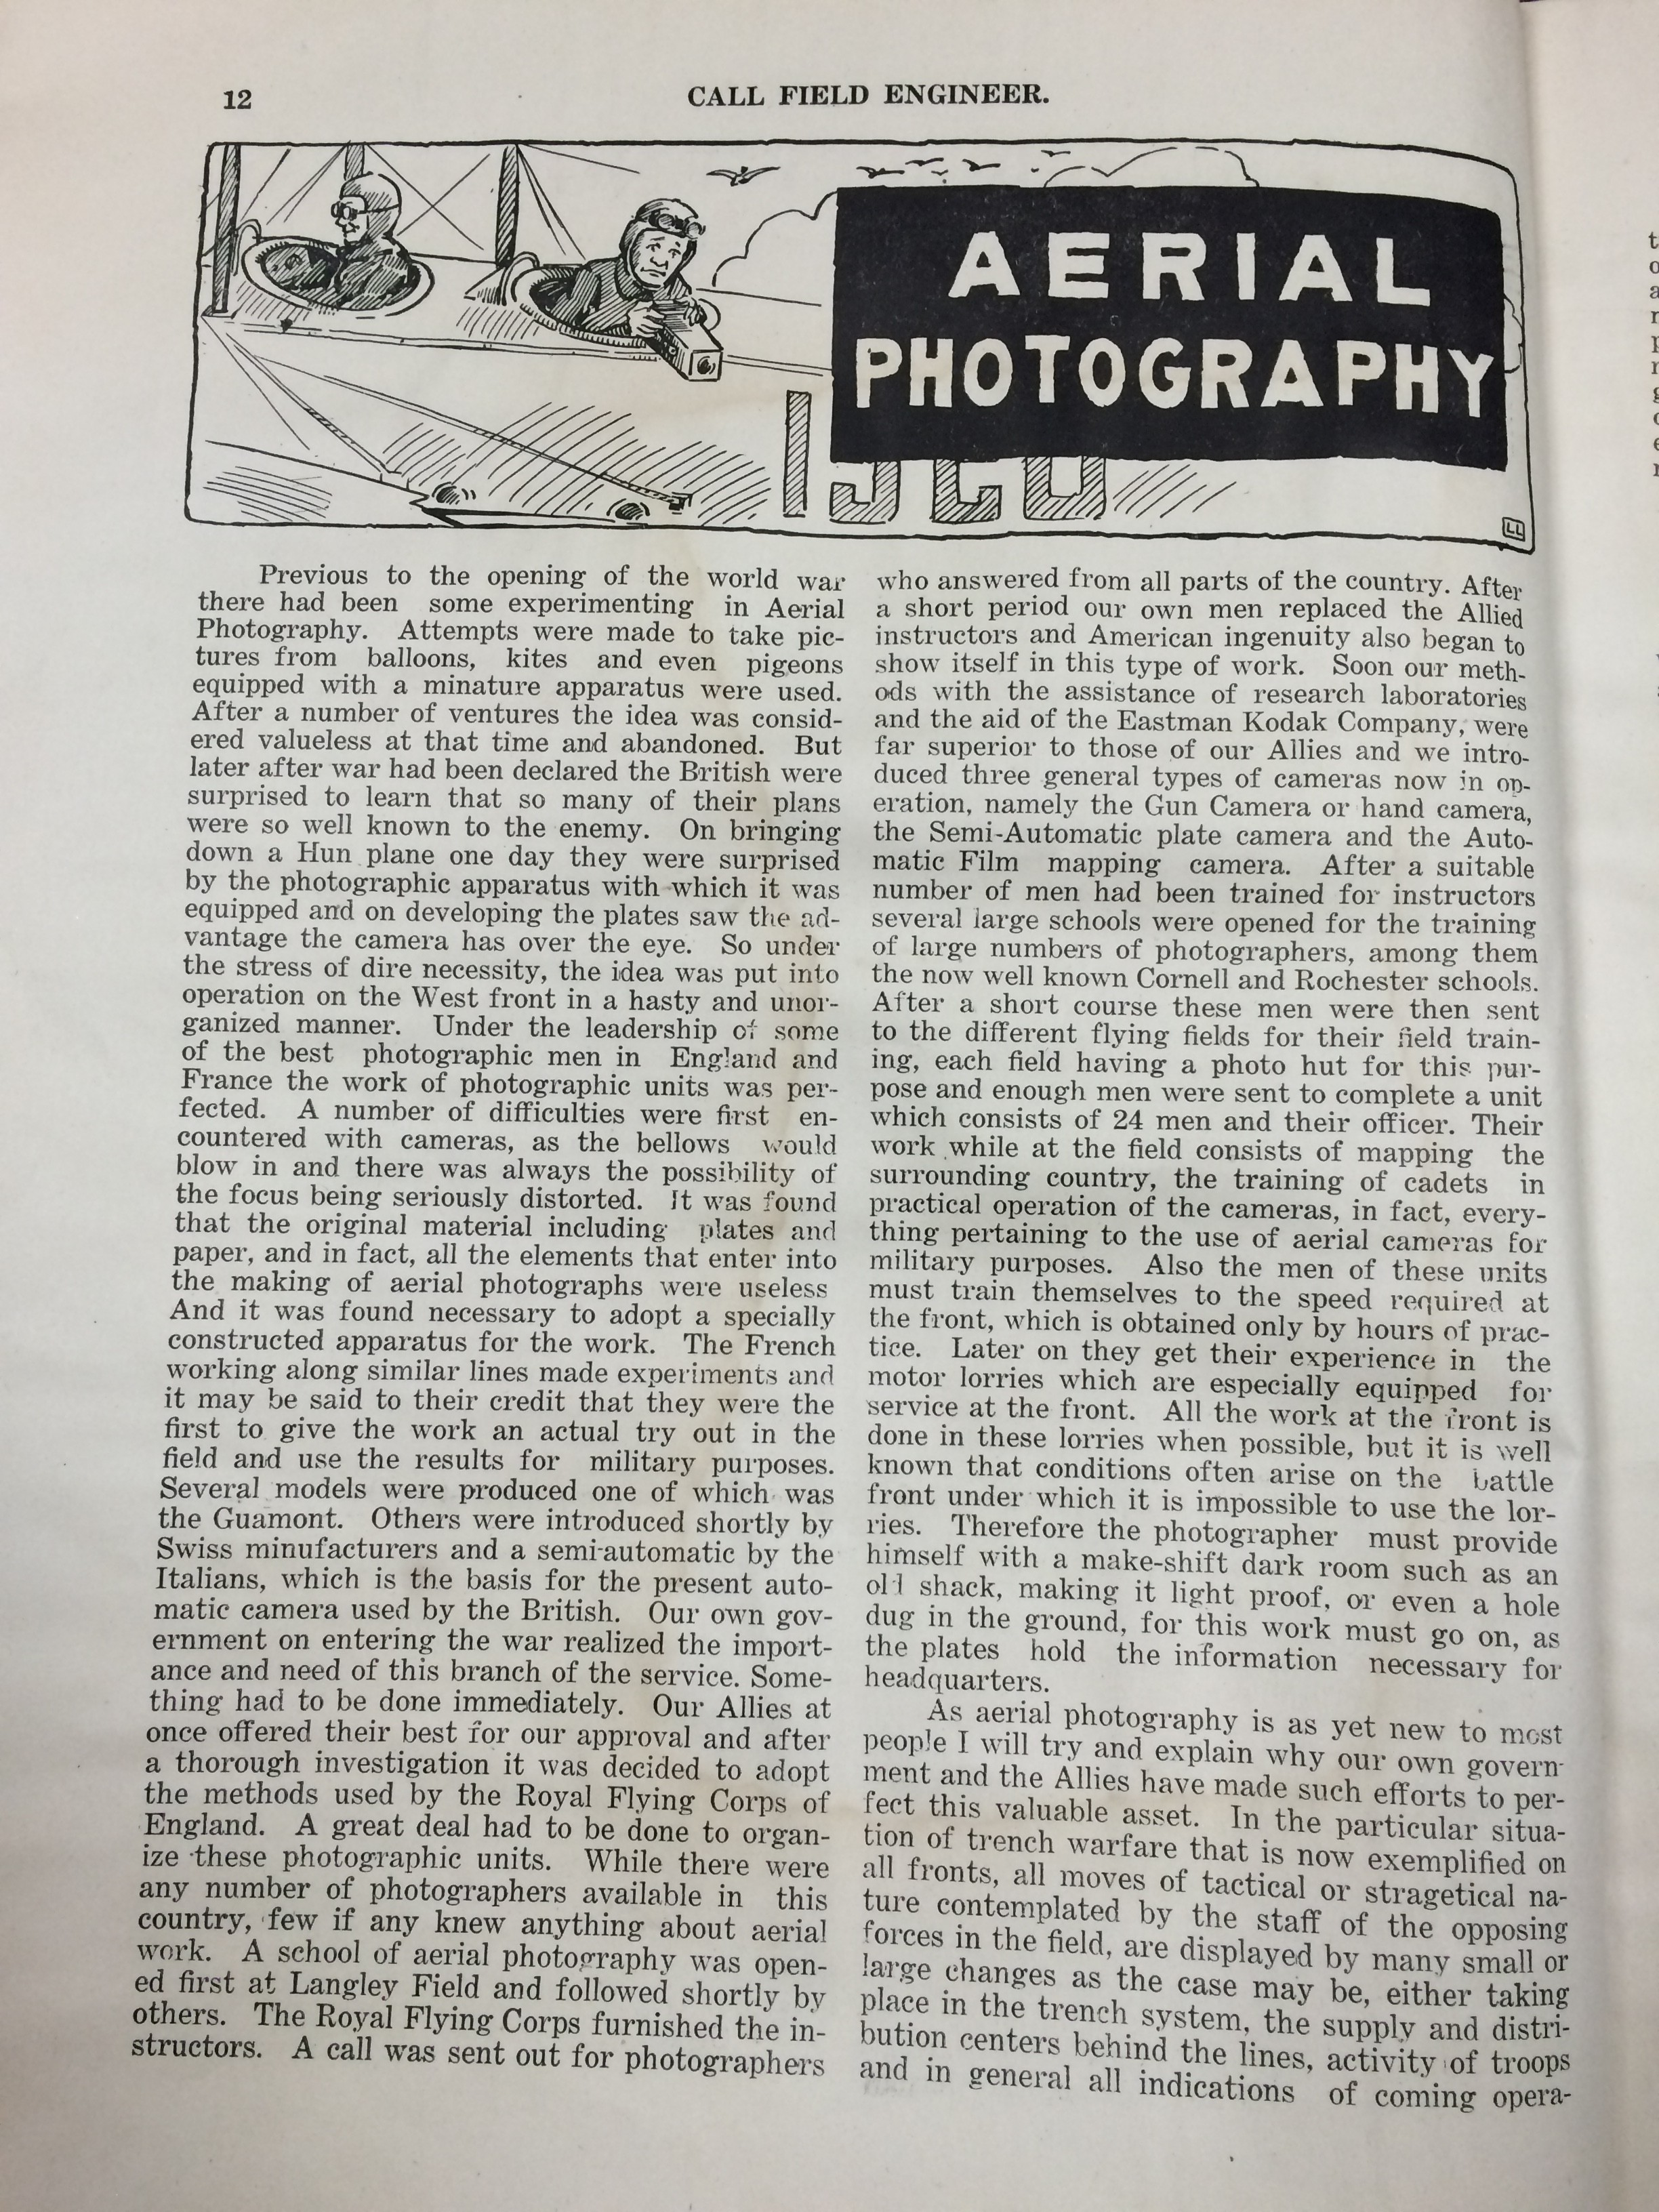 Image 14 August 15, 1918 Call Field Engineer